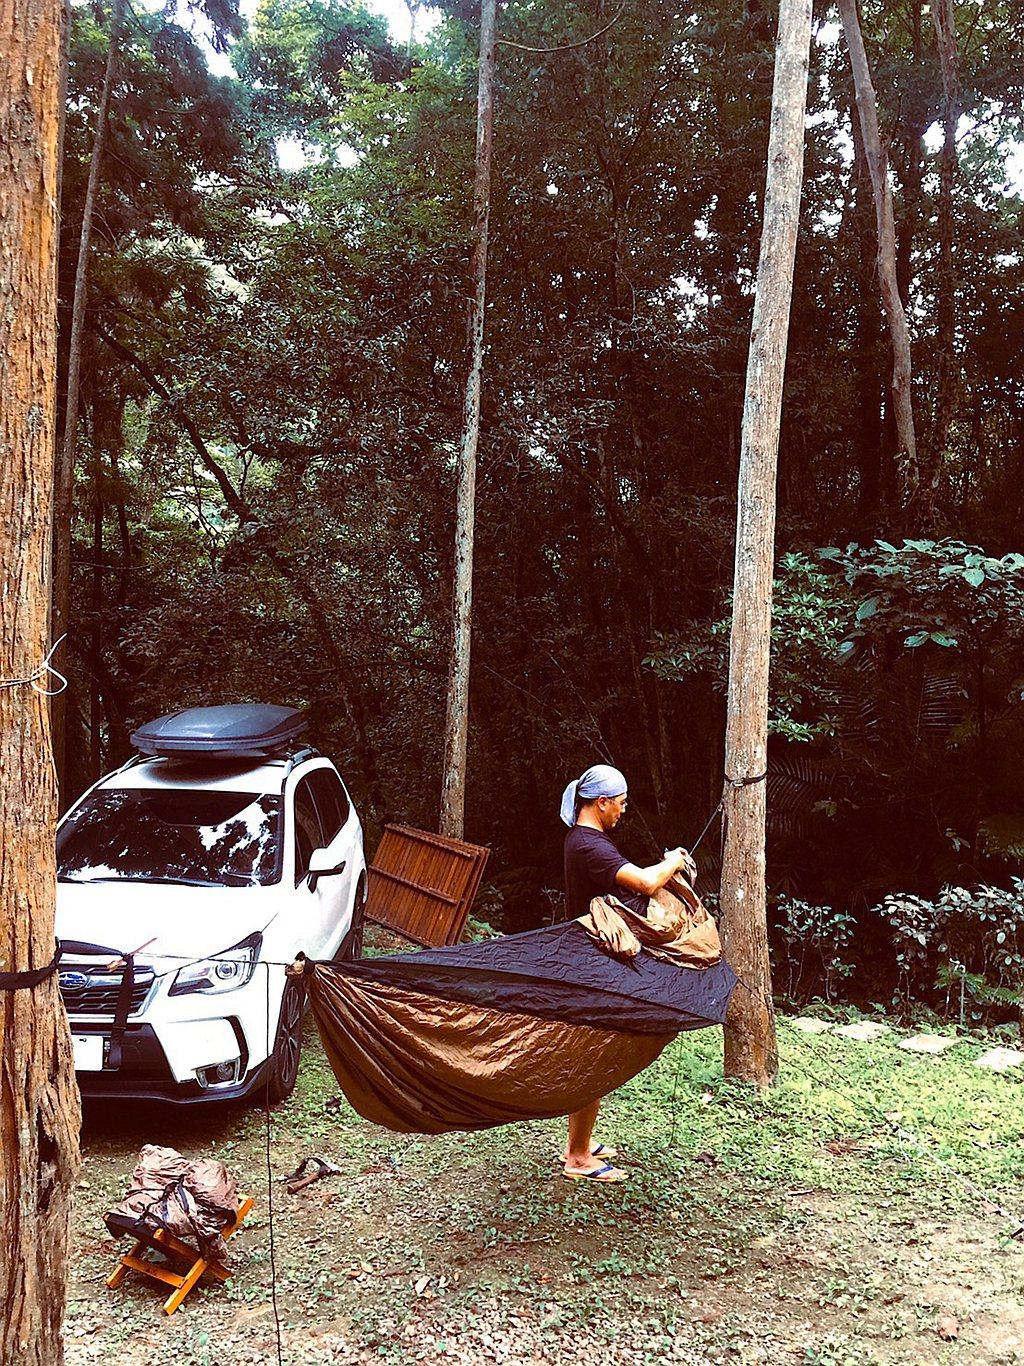 Subaru台灣意美汽車邀請真實素人車主,拍攝年度品牌形象影片「Subaru挺你...